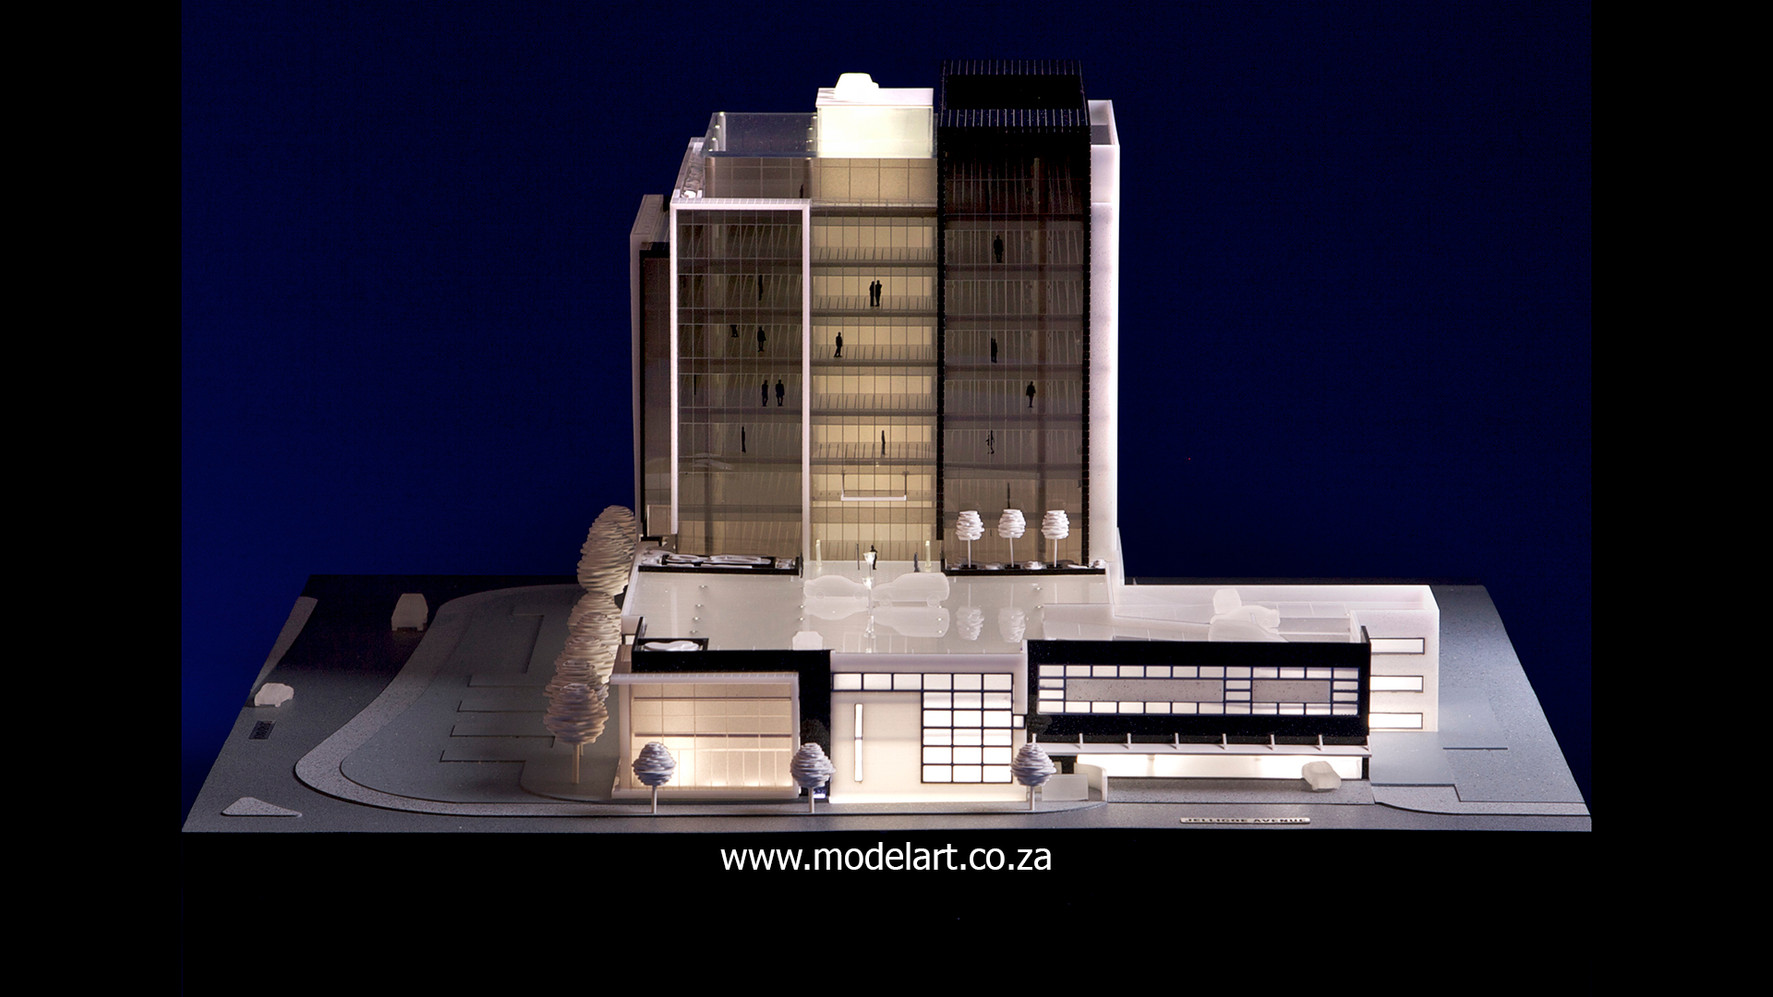 Architectural-Scale-Model-Conceptual-Tiber Rosebank-2